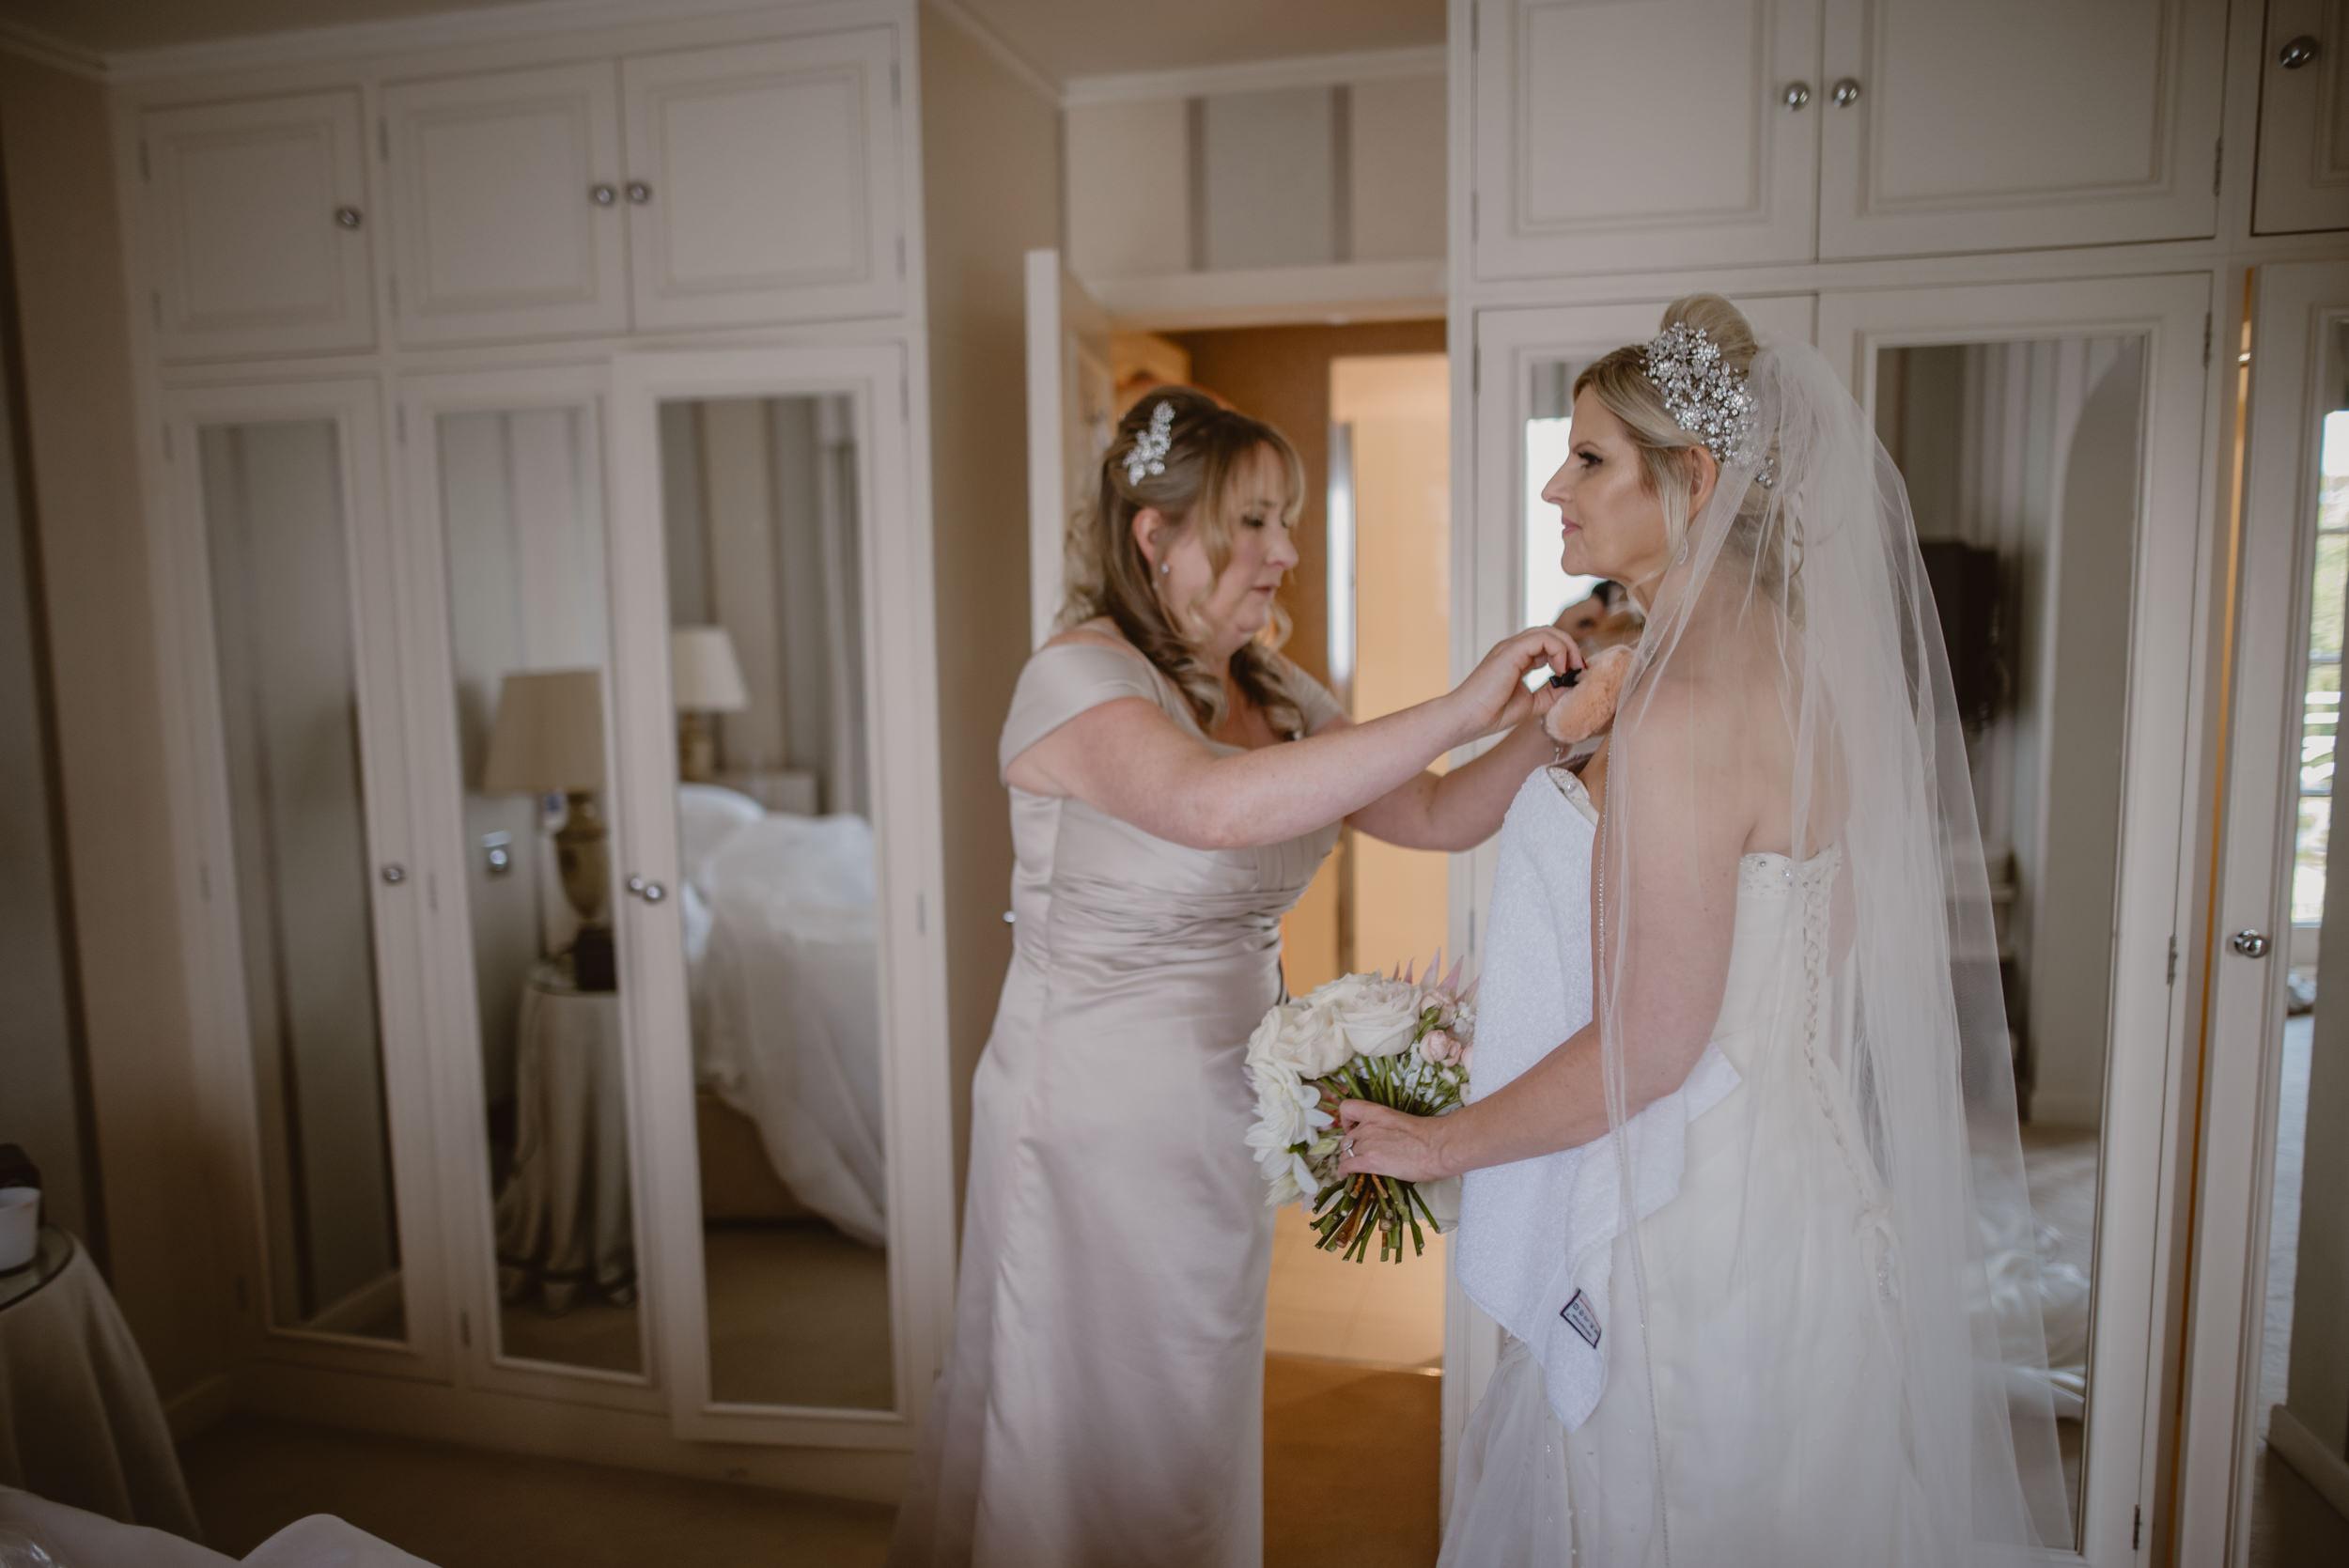 Trisha-and-Roger-wedding-The-Priory-Church-and-Chewton-Glen-Hotel-Christchurch-Manu-Mendoza-Wedding-Photography-084.jpg